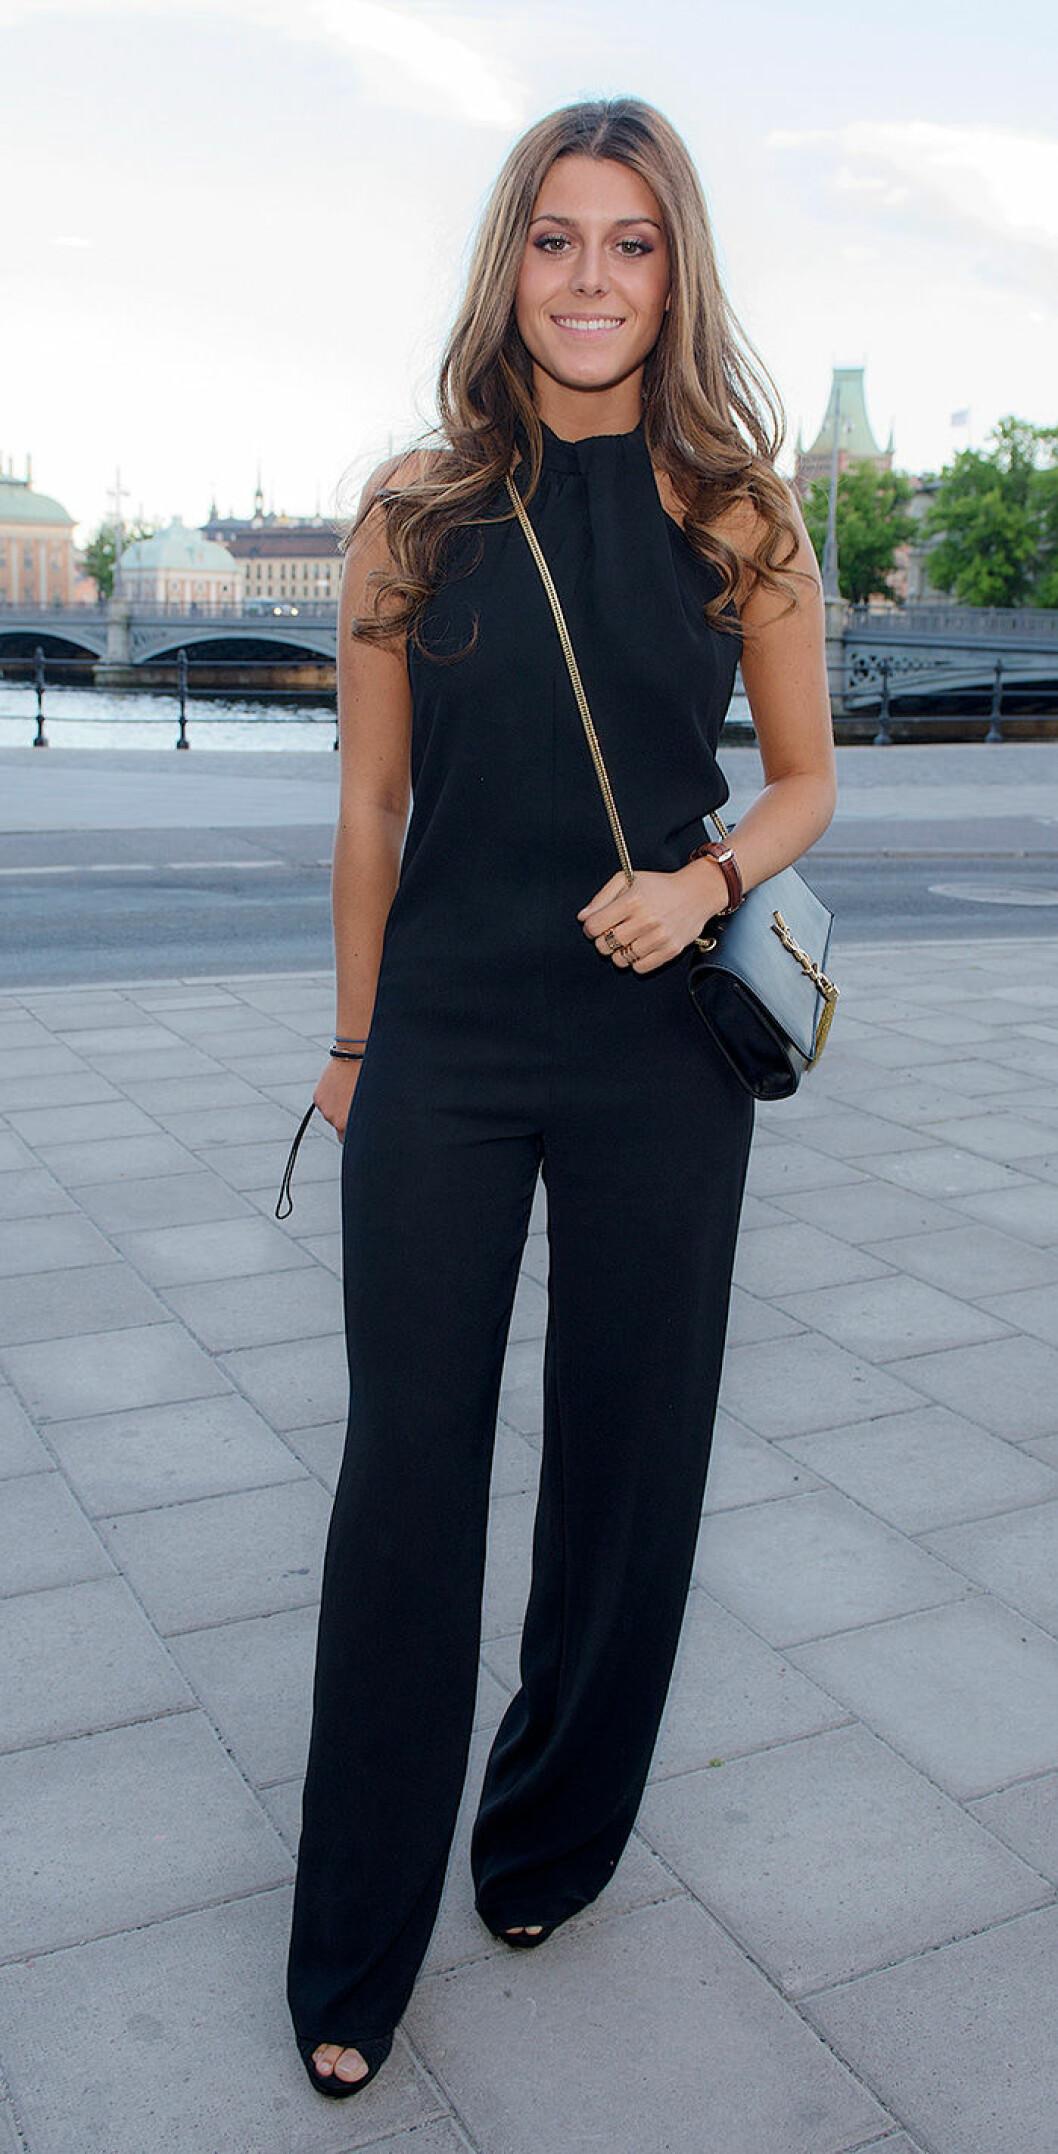 En bild på Bianca Ingrosso sommaren 2015.